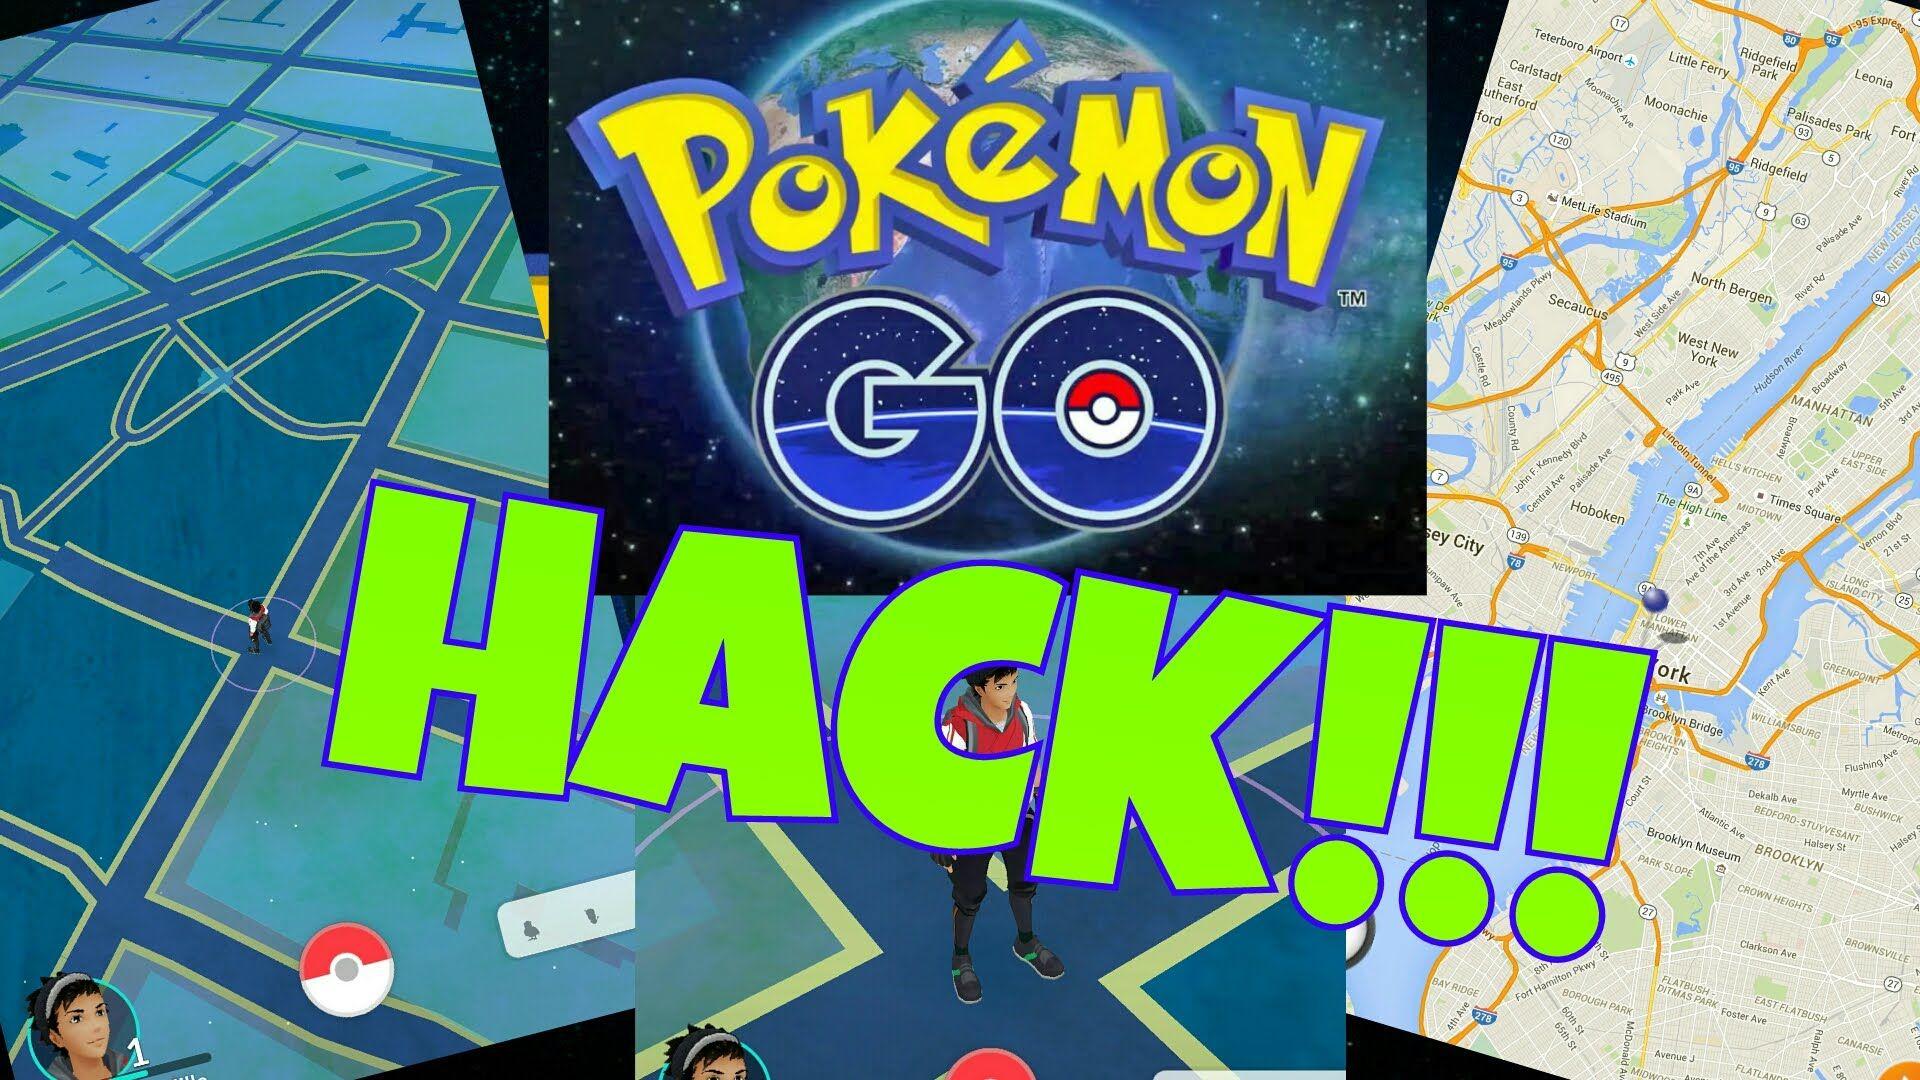 Pokemon Go Hack Android iOS App apk Mod No Survey Free